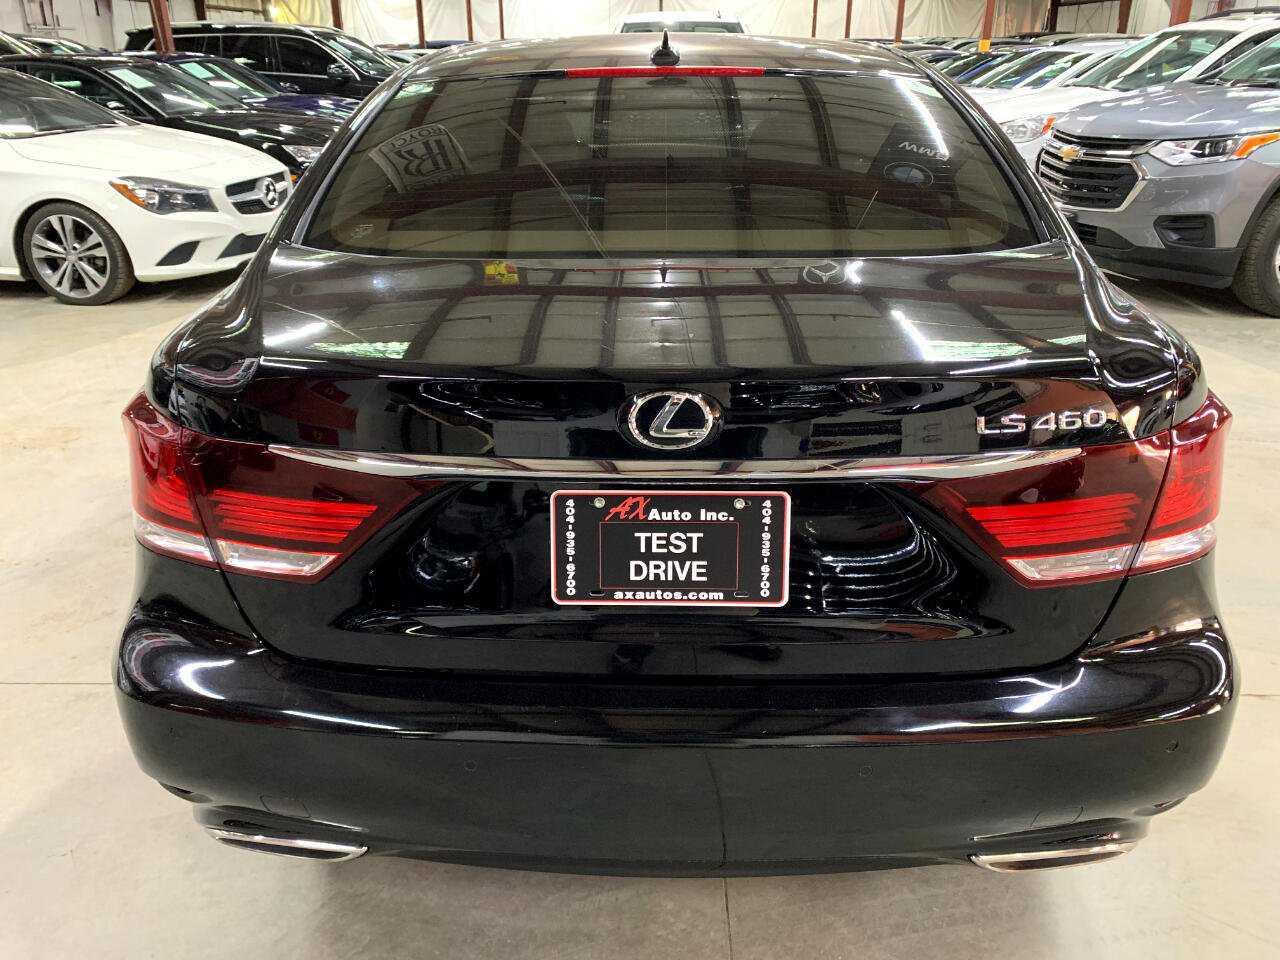 New black Lexus back view